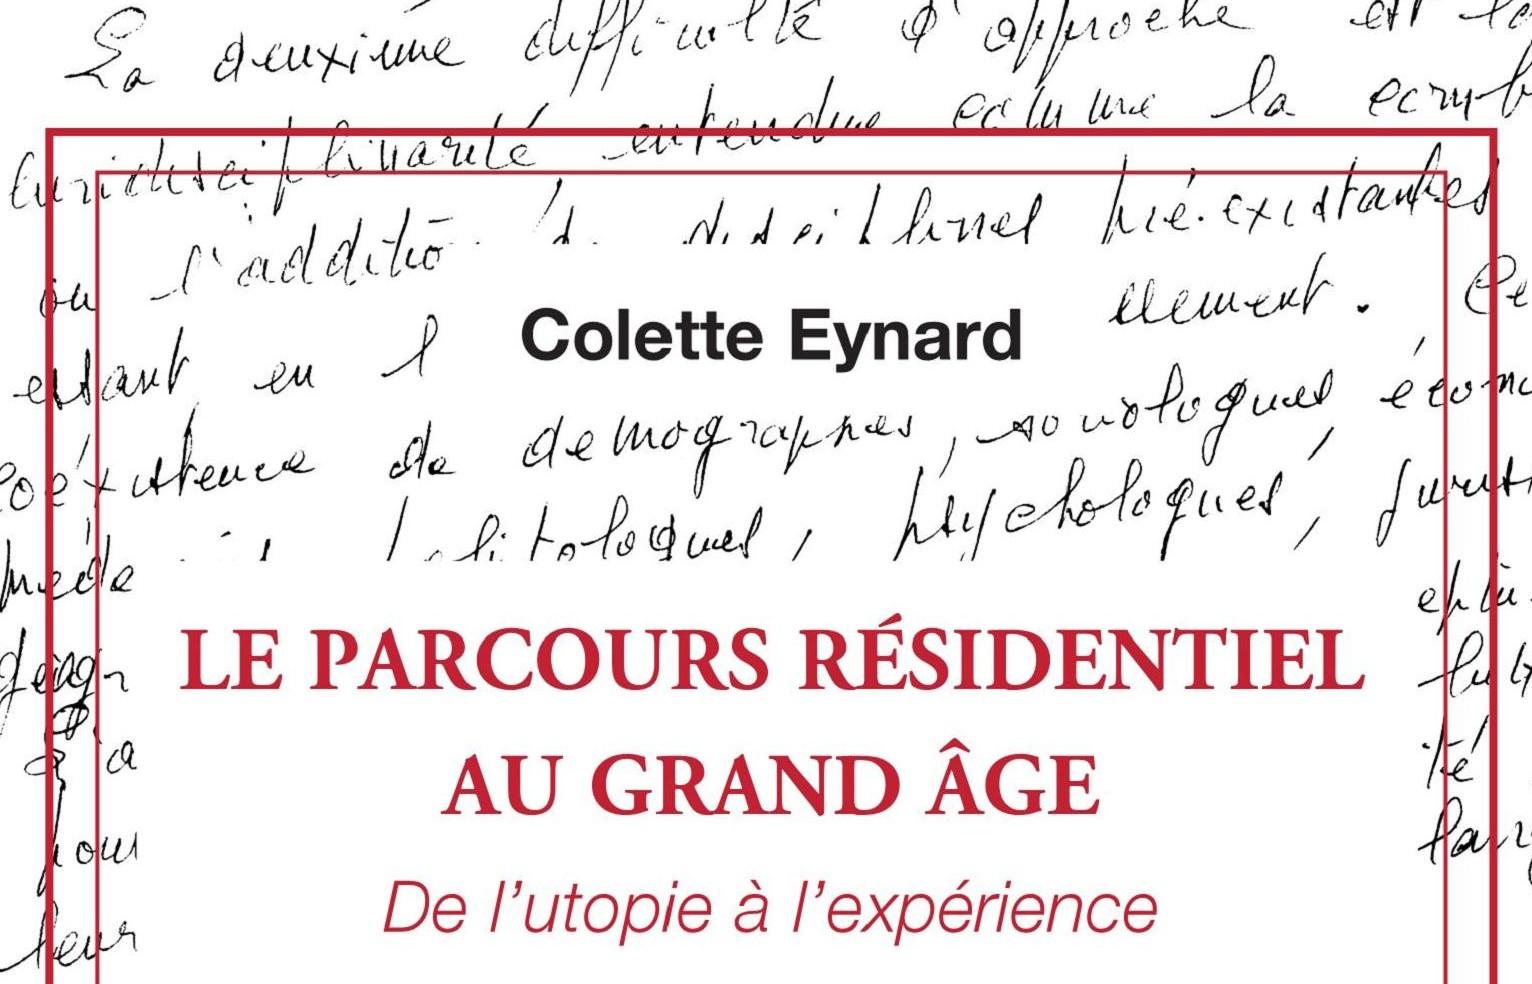 ima. C. Eynard